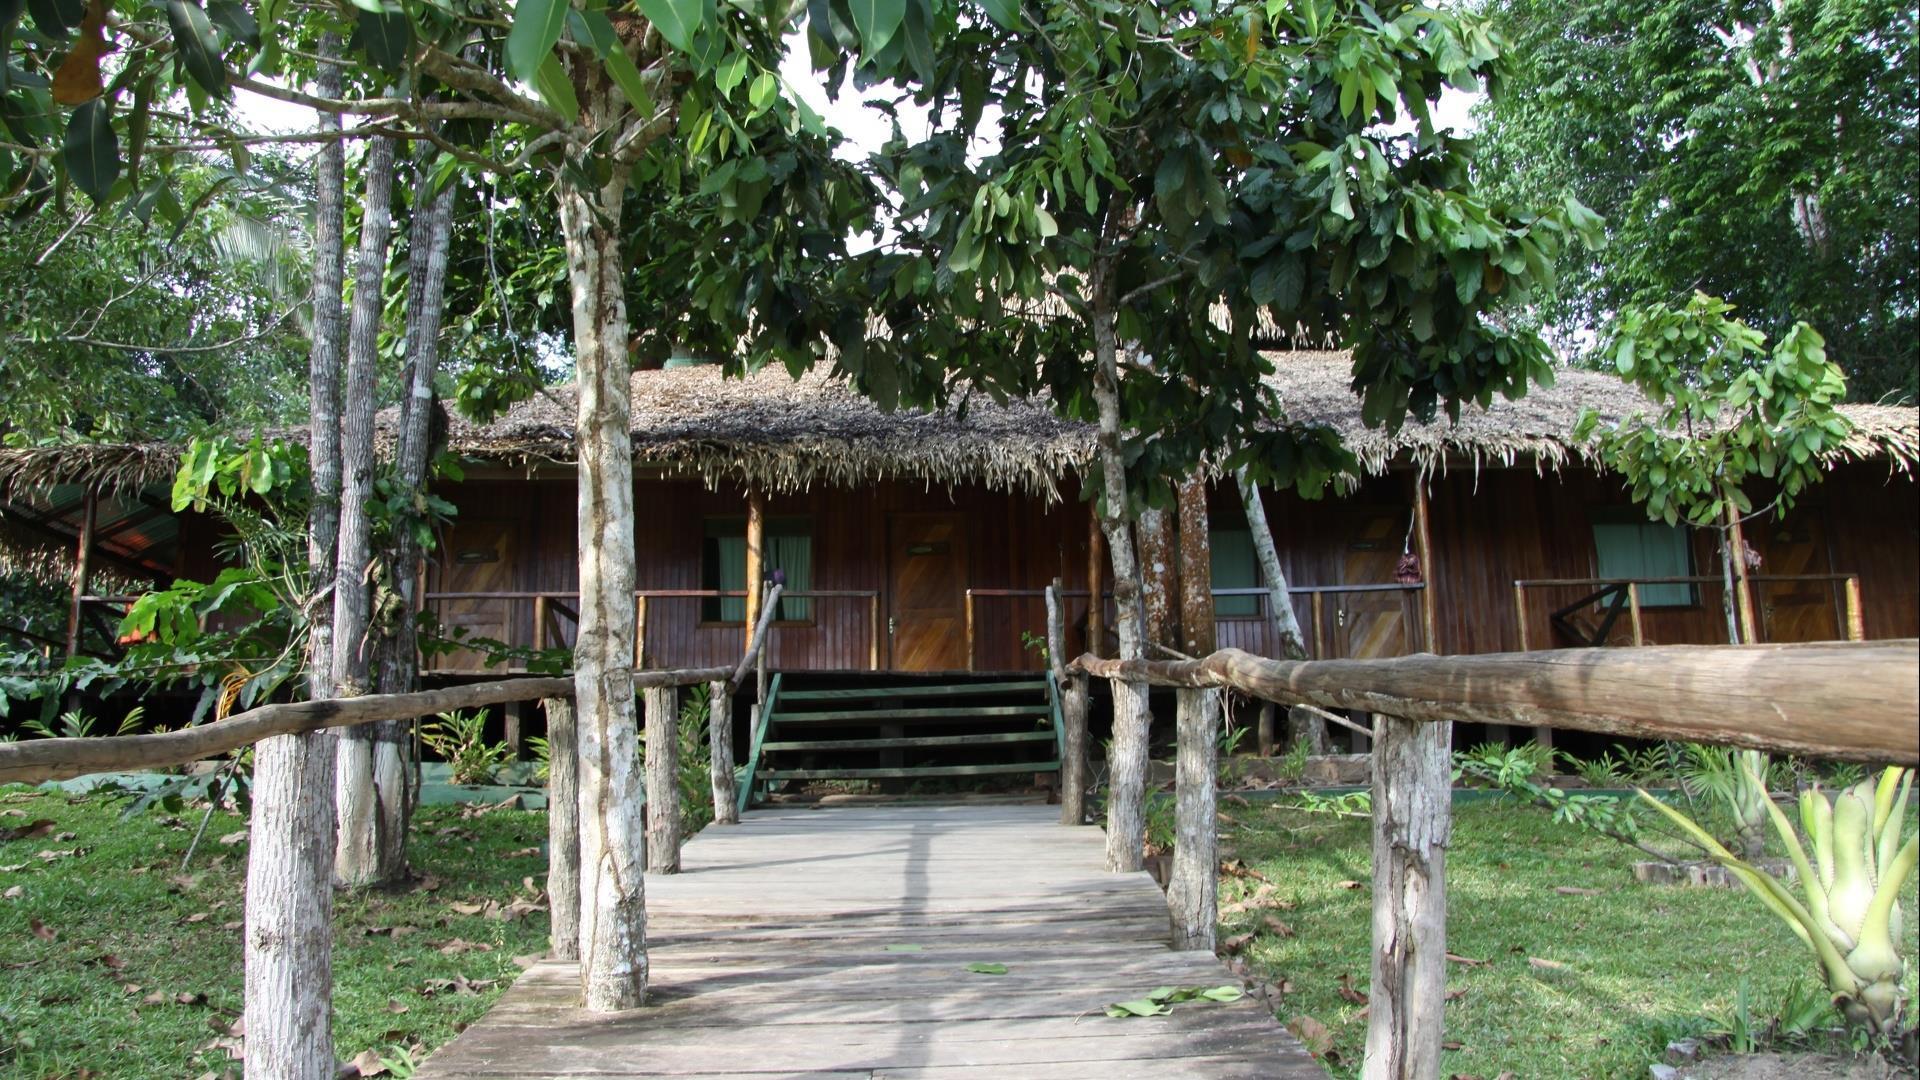 Brasilien Amazonas: 3 bis 6 Tage Reisebausteine - Tupana Lodge